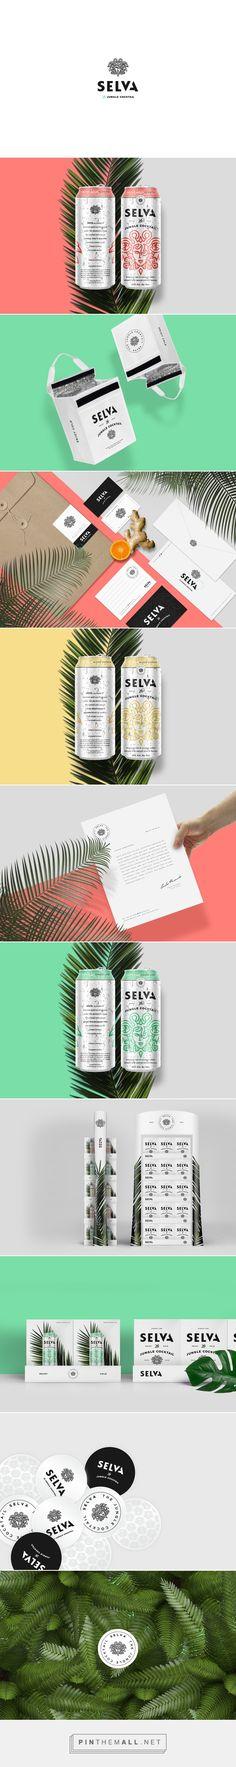 Selva Jungle Cocktail Packaging on Behance | Fivestar Branding – Design and…